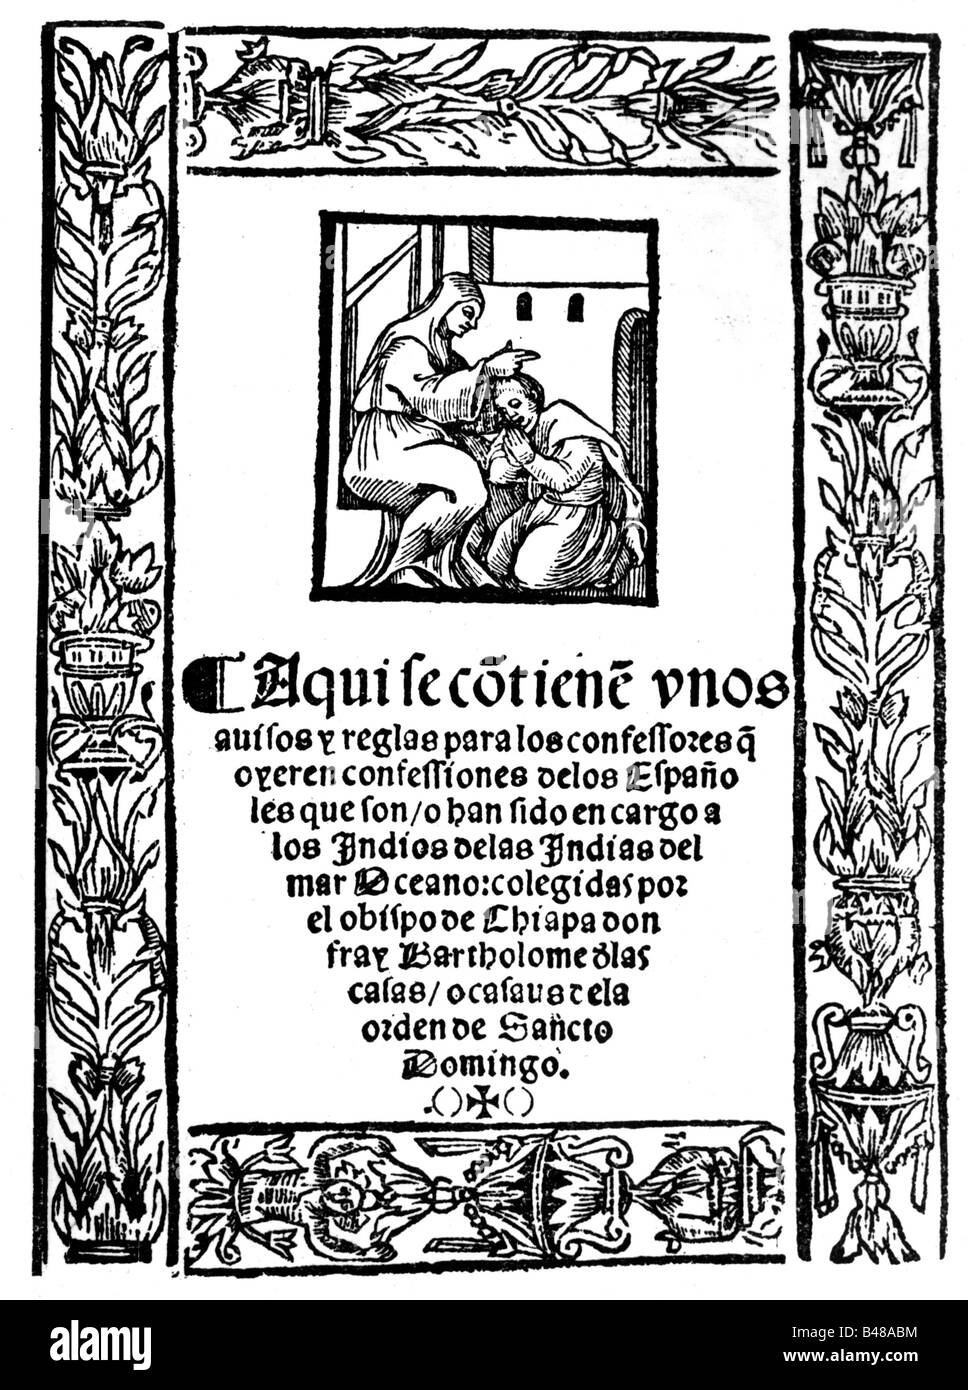 Las Casas, Bartolommeo de, 1484 / 1485 - 31.7.1566, Spanish clergyman, works, 'Historica apologetica', Sevilla, - Stock Image